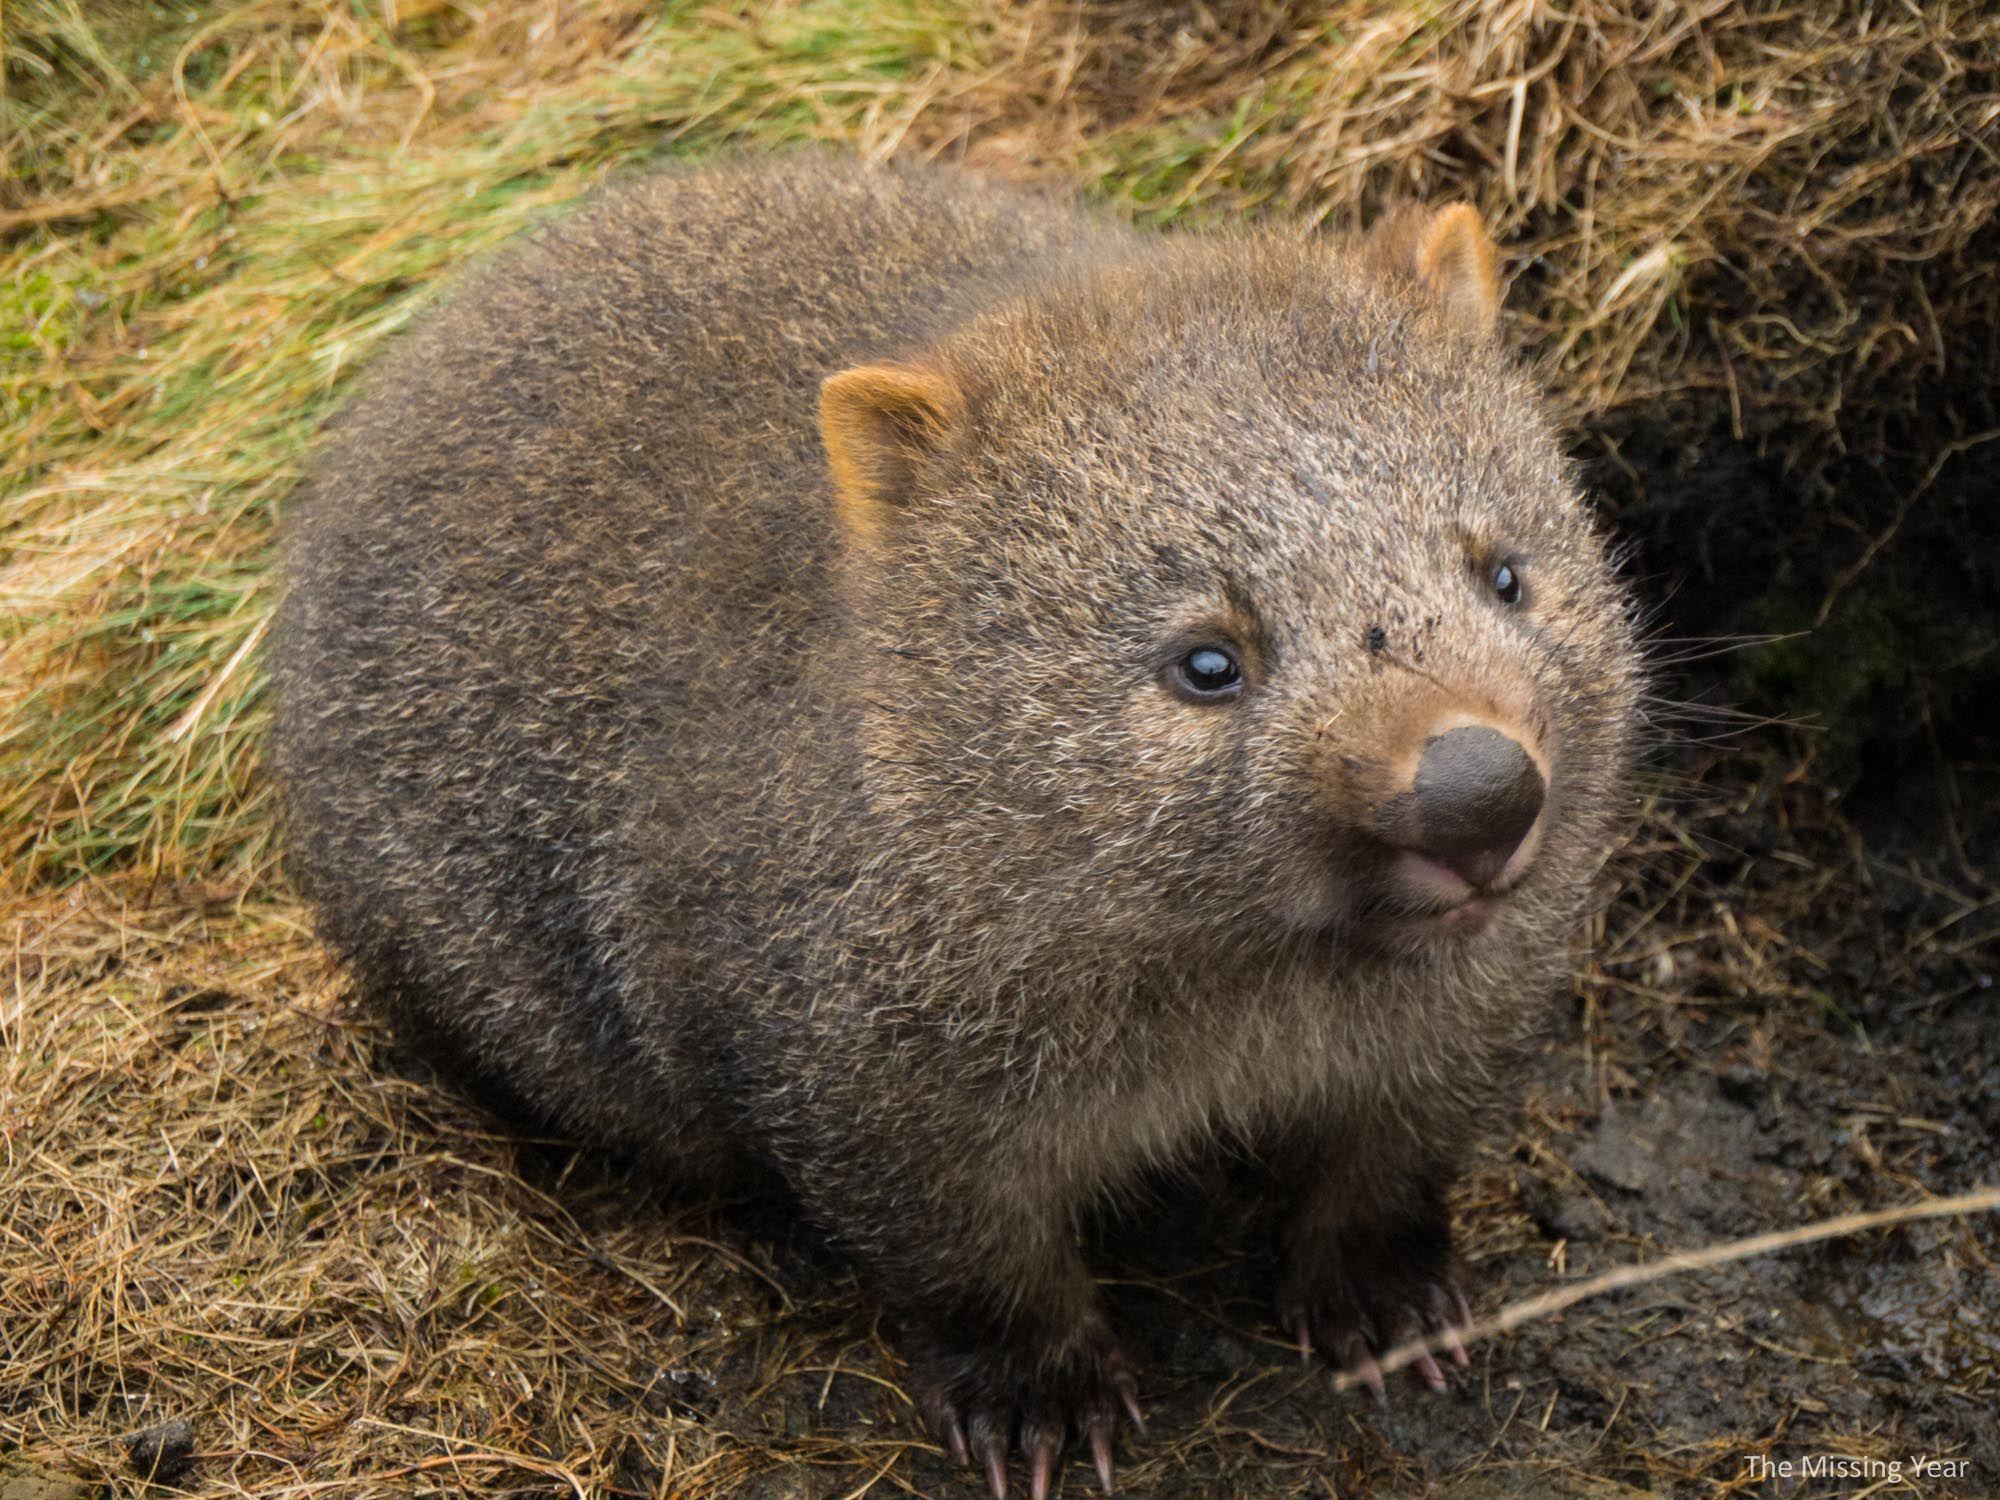 wombat - Google 搜尋 | ウォンバット, 可愛すぎる動物, 可愛い 動物